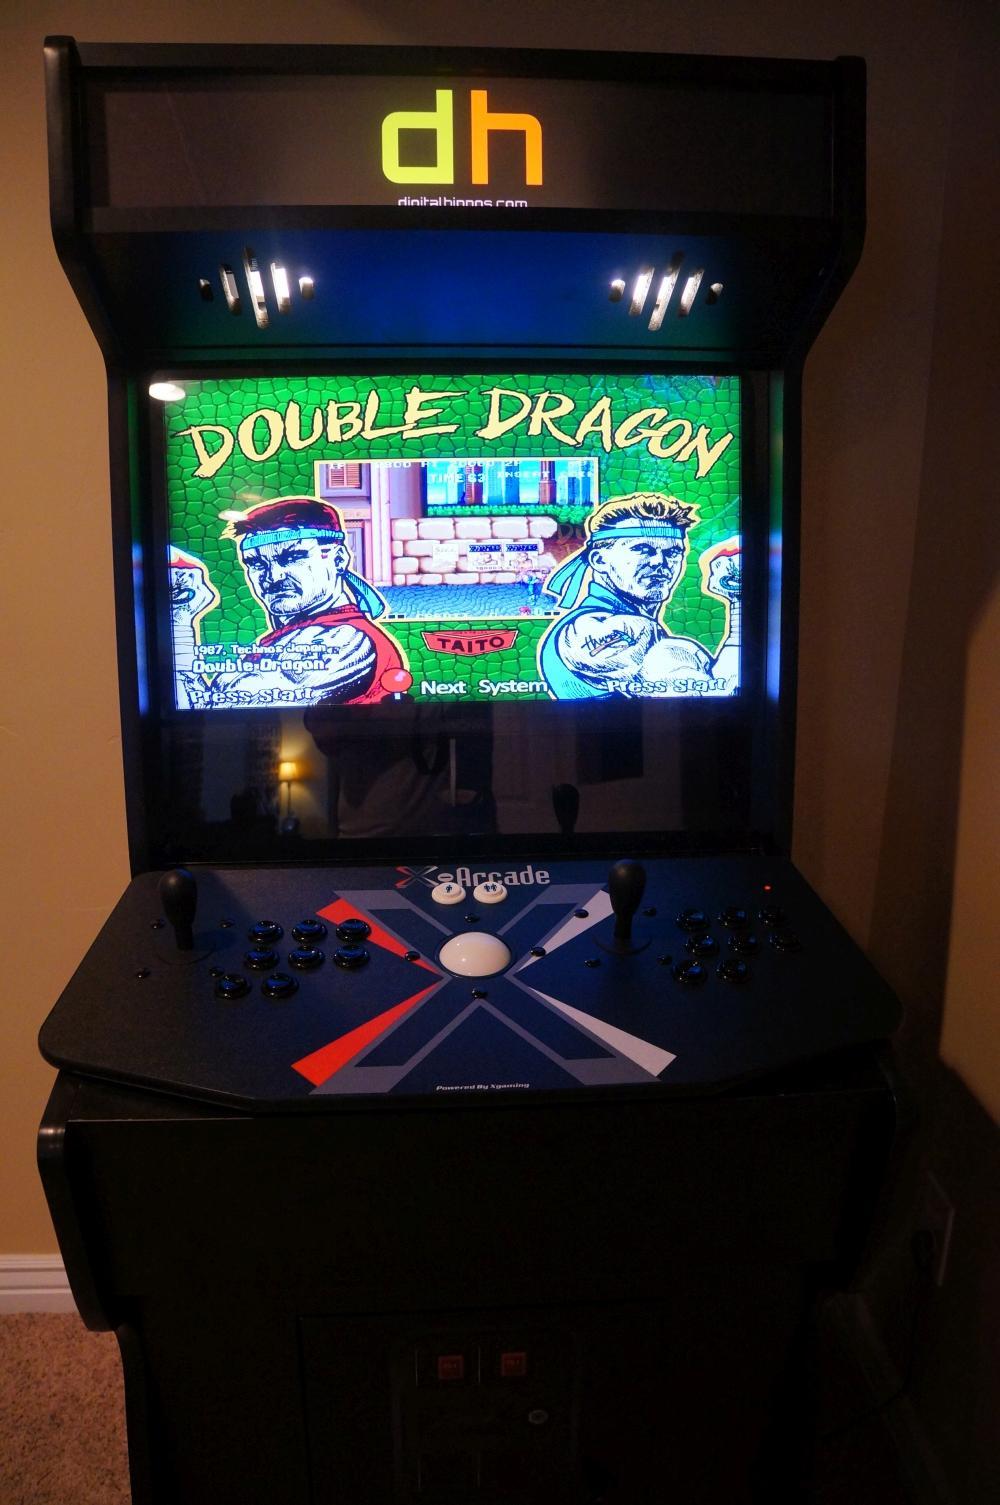 Spotlight: The Digital Hippos Custom Arcade Cabinet   Digital Hippos